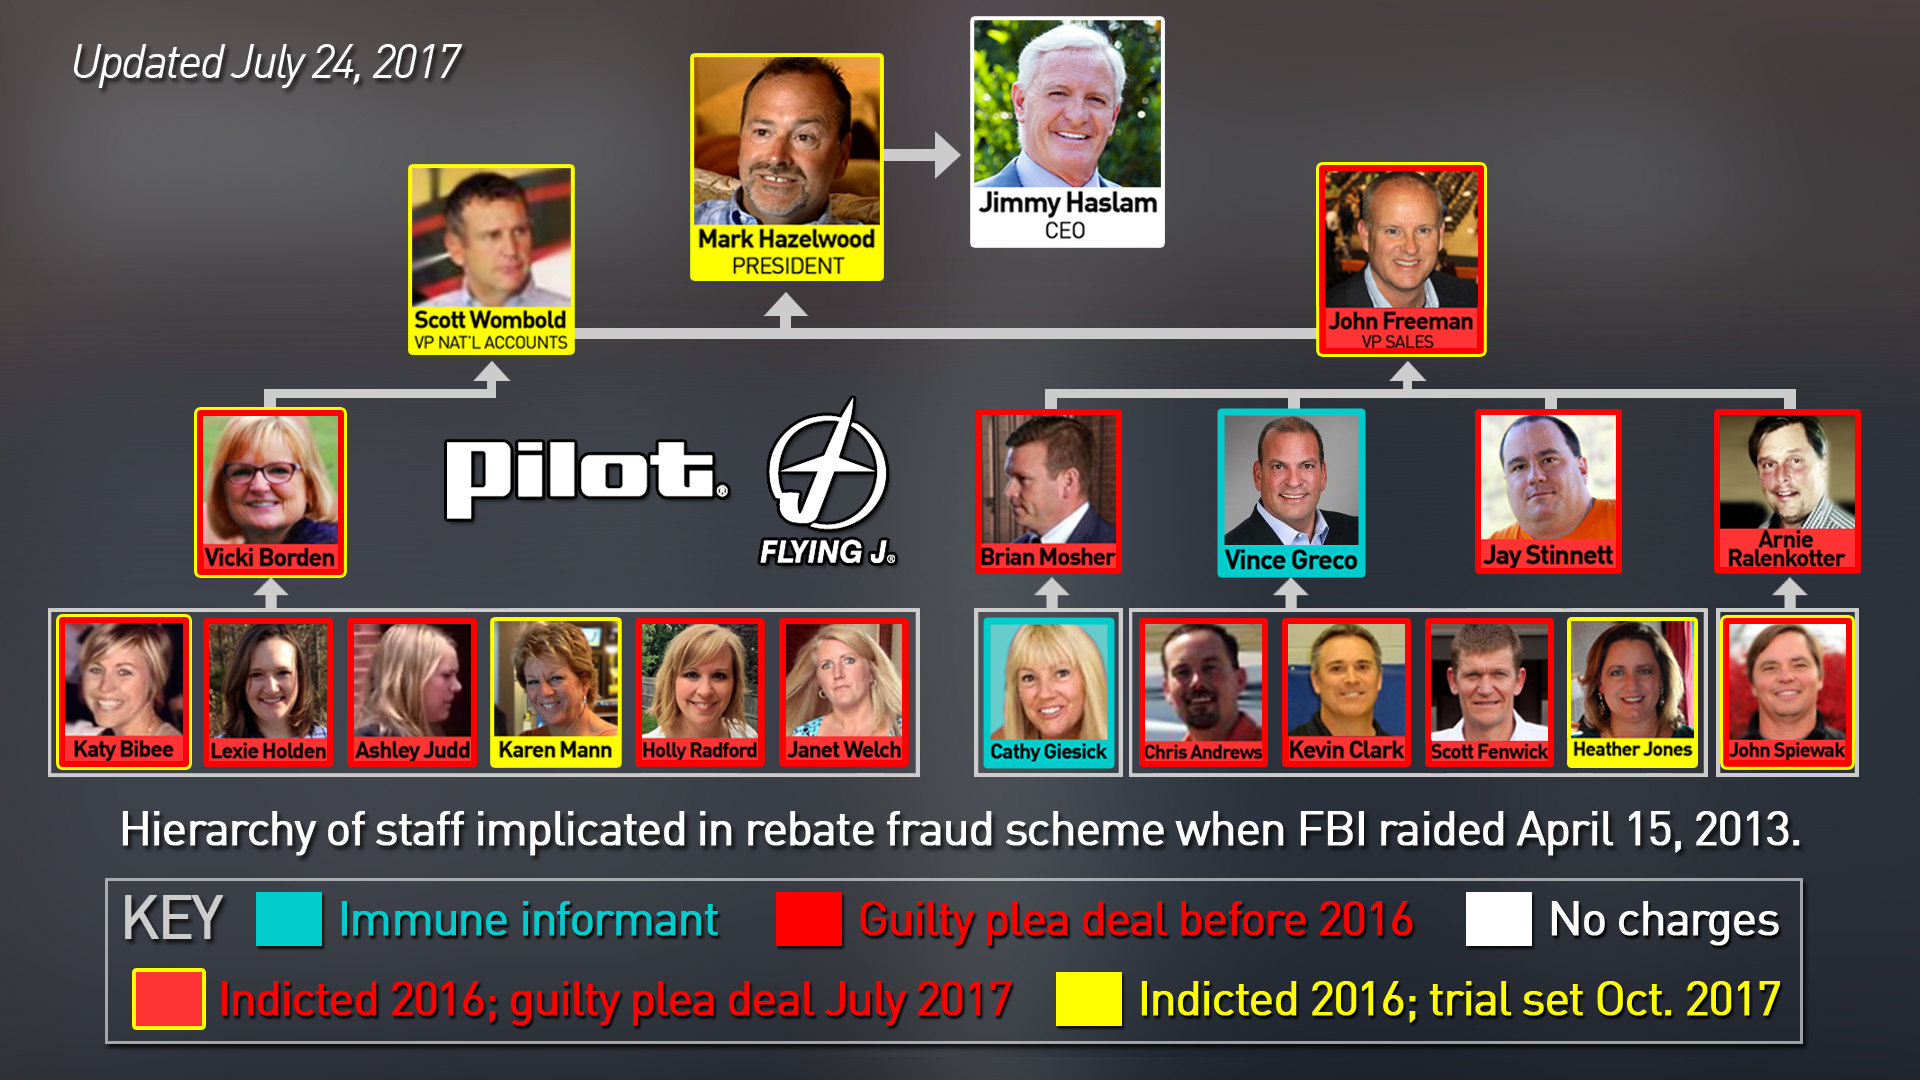 Pilot Flying J fraud scam organization flow chart of top former executives.jpg